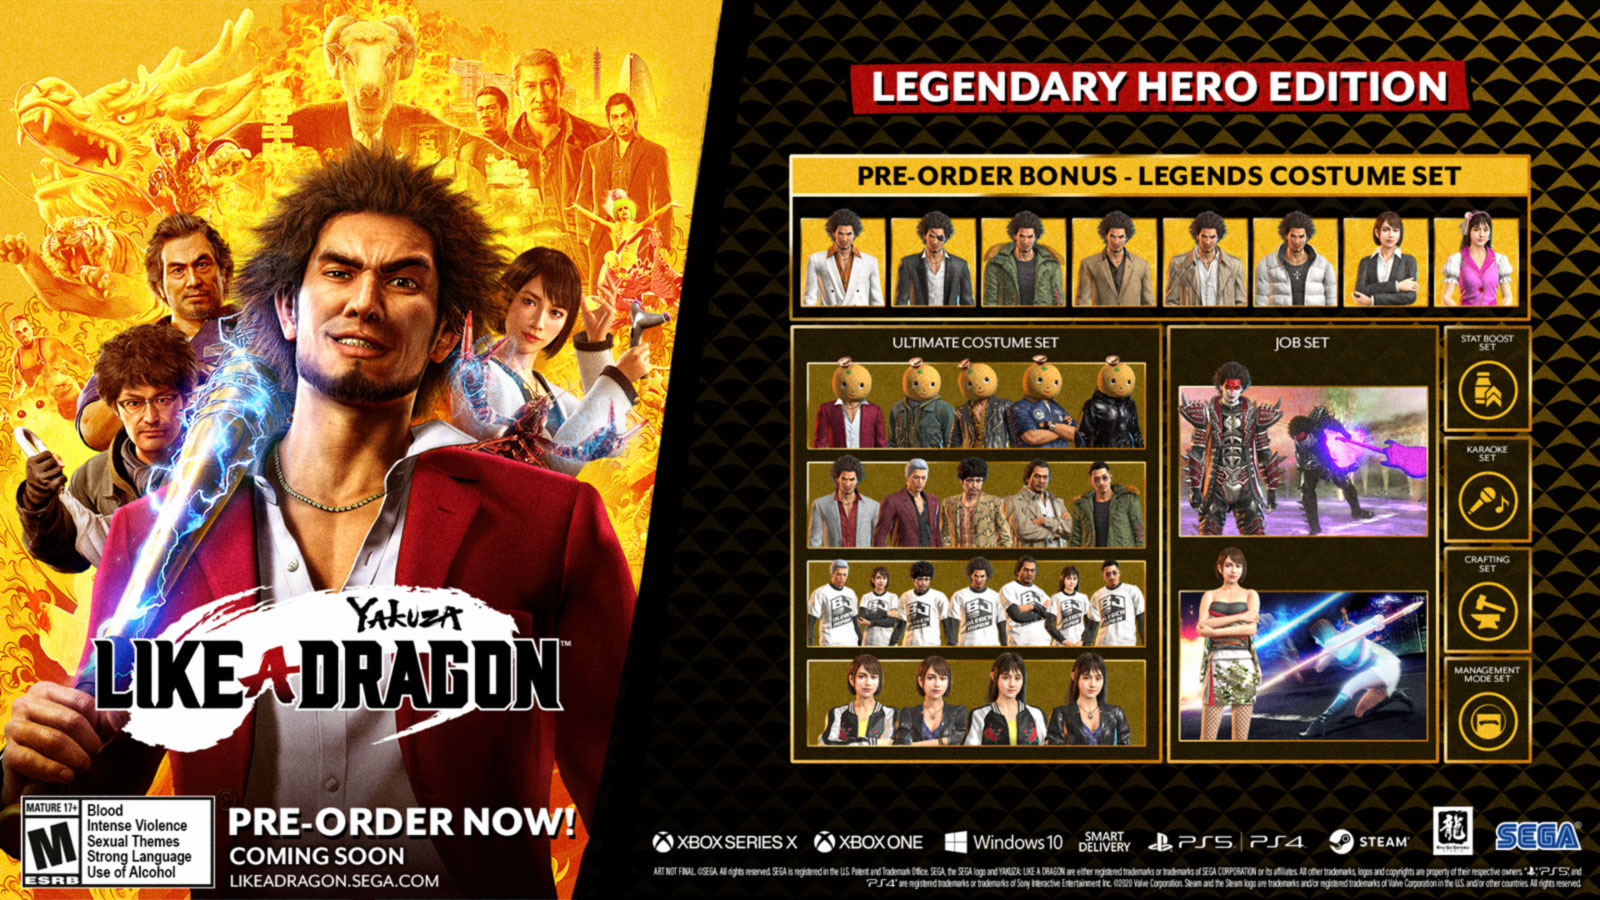 Yakuza: Like a Dragon – Digital Legendary Hero Edition